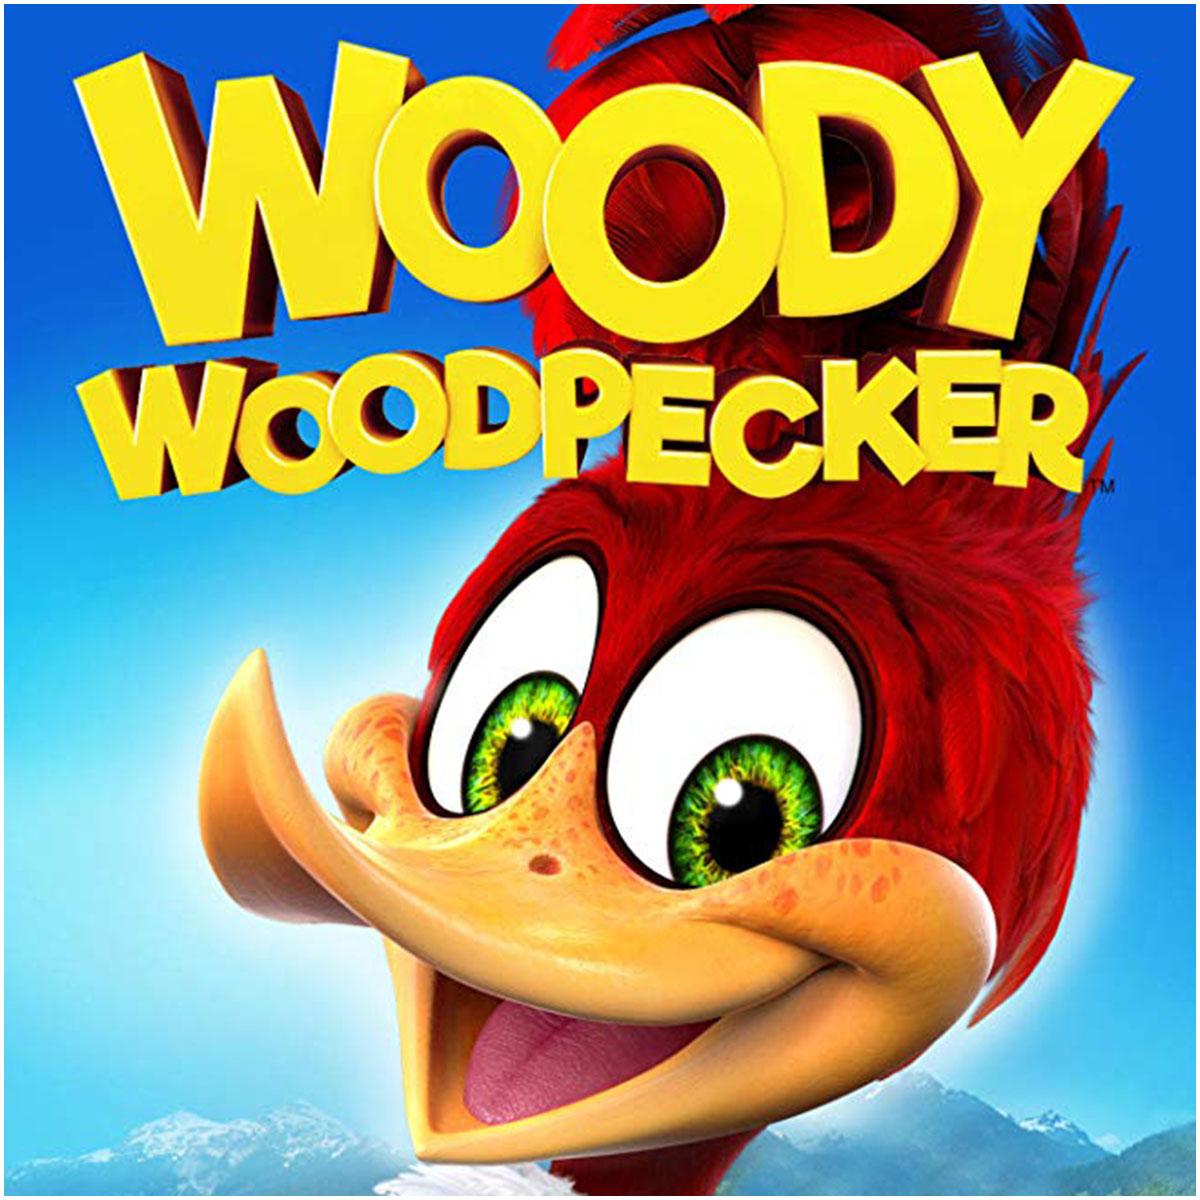 Woody Woodpecker_thumb.jpg